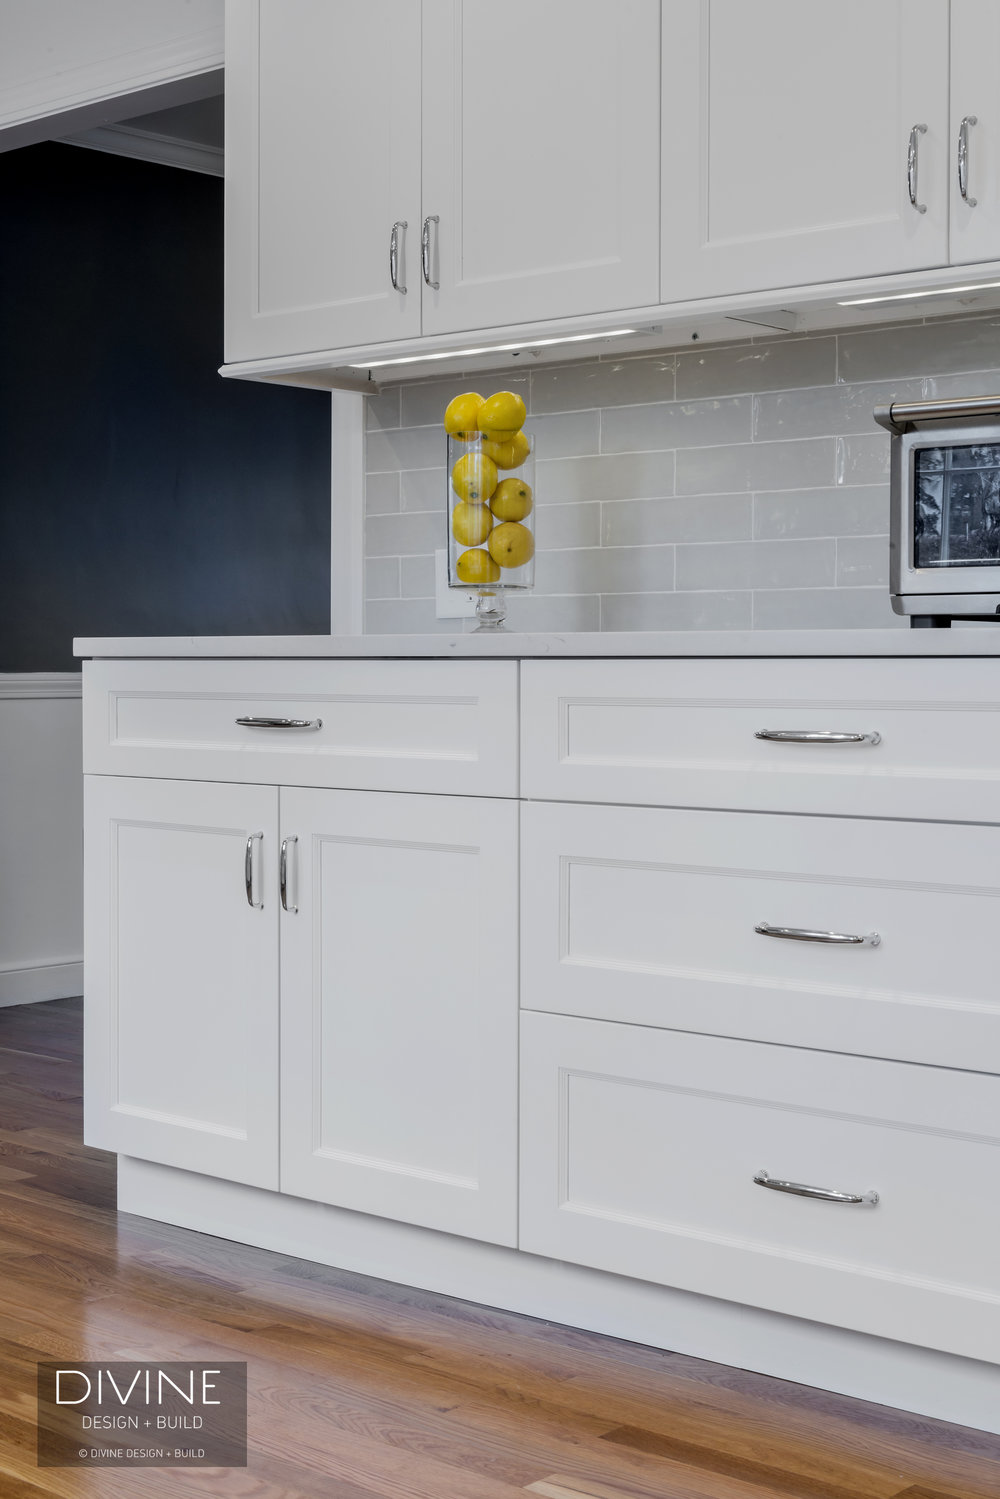 - 8 Pictures Of Kitchens With Subway Tile Backsplashes — Divine Design+Build